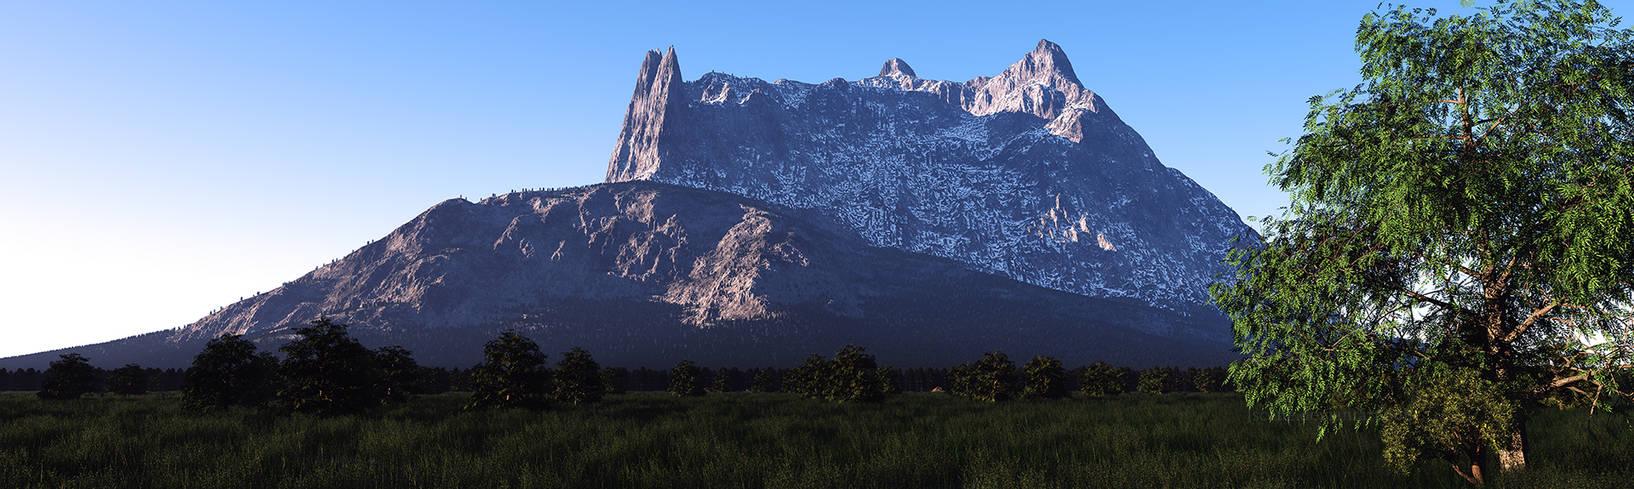 Crown Mountain